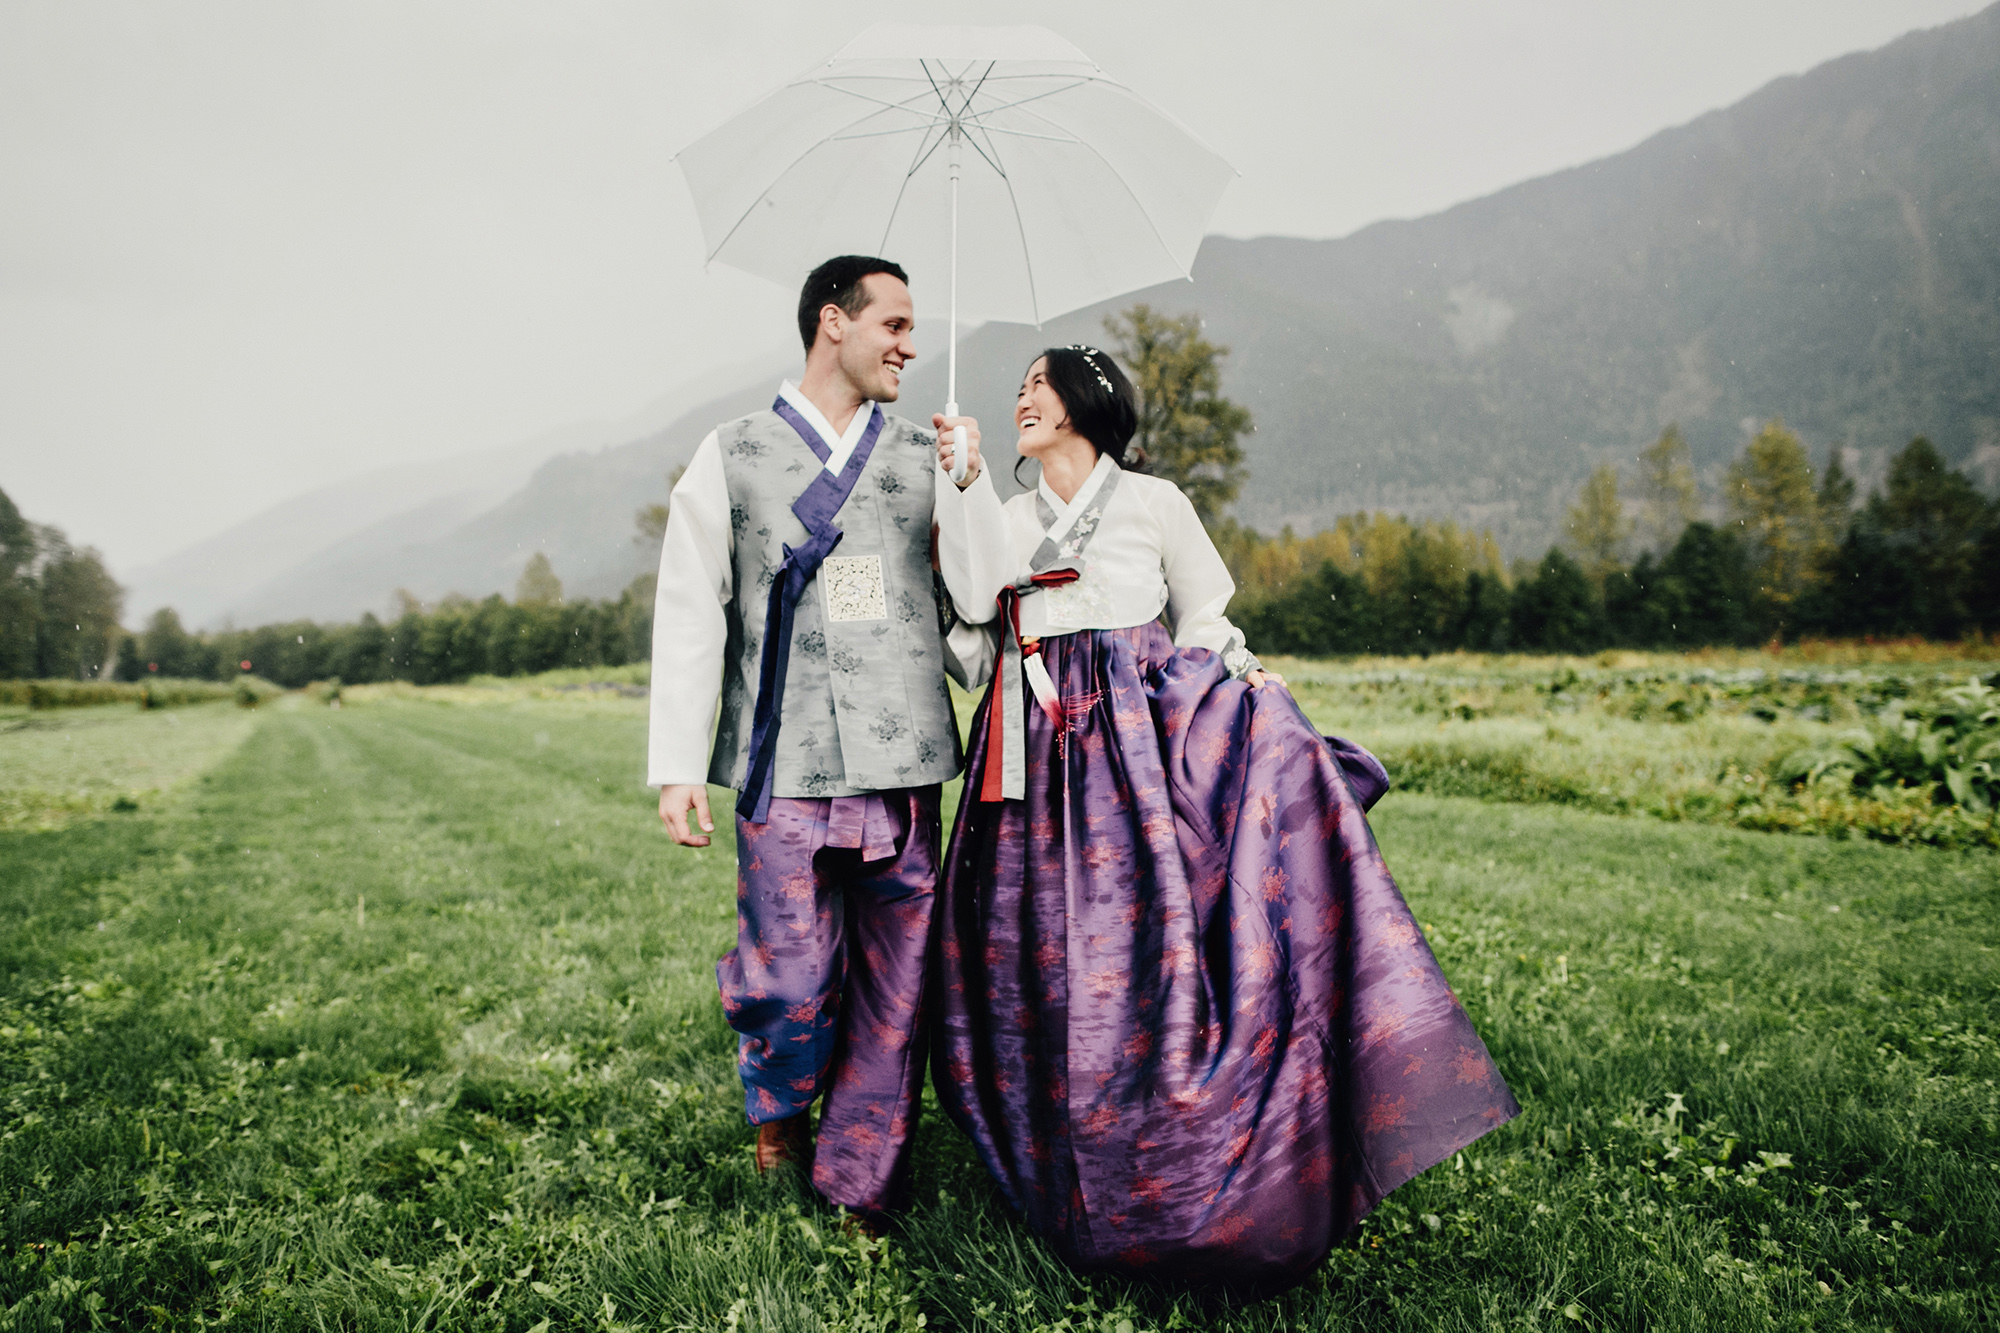 taylor-roades-weddings-0004A.JPG